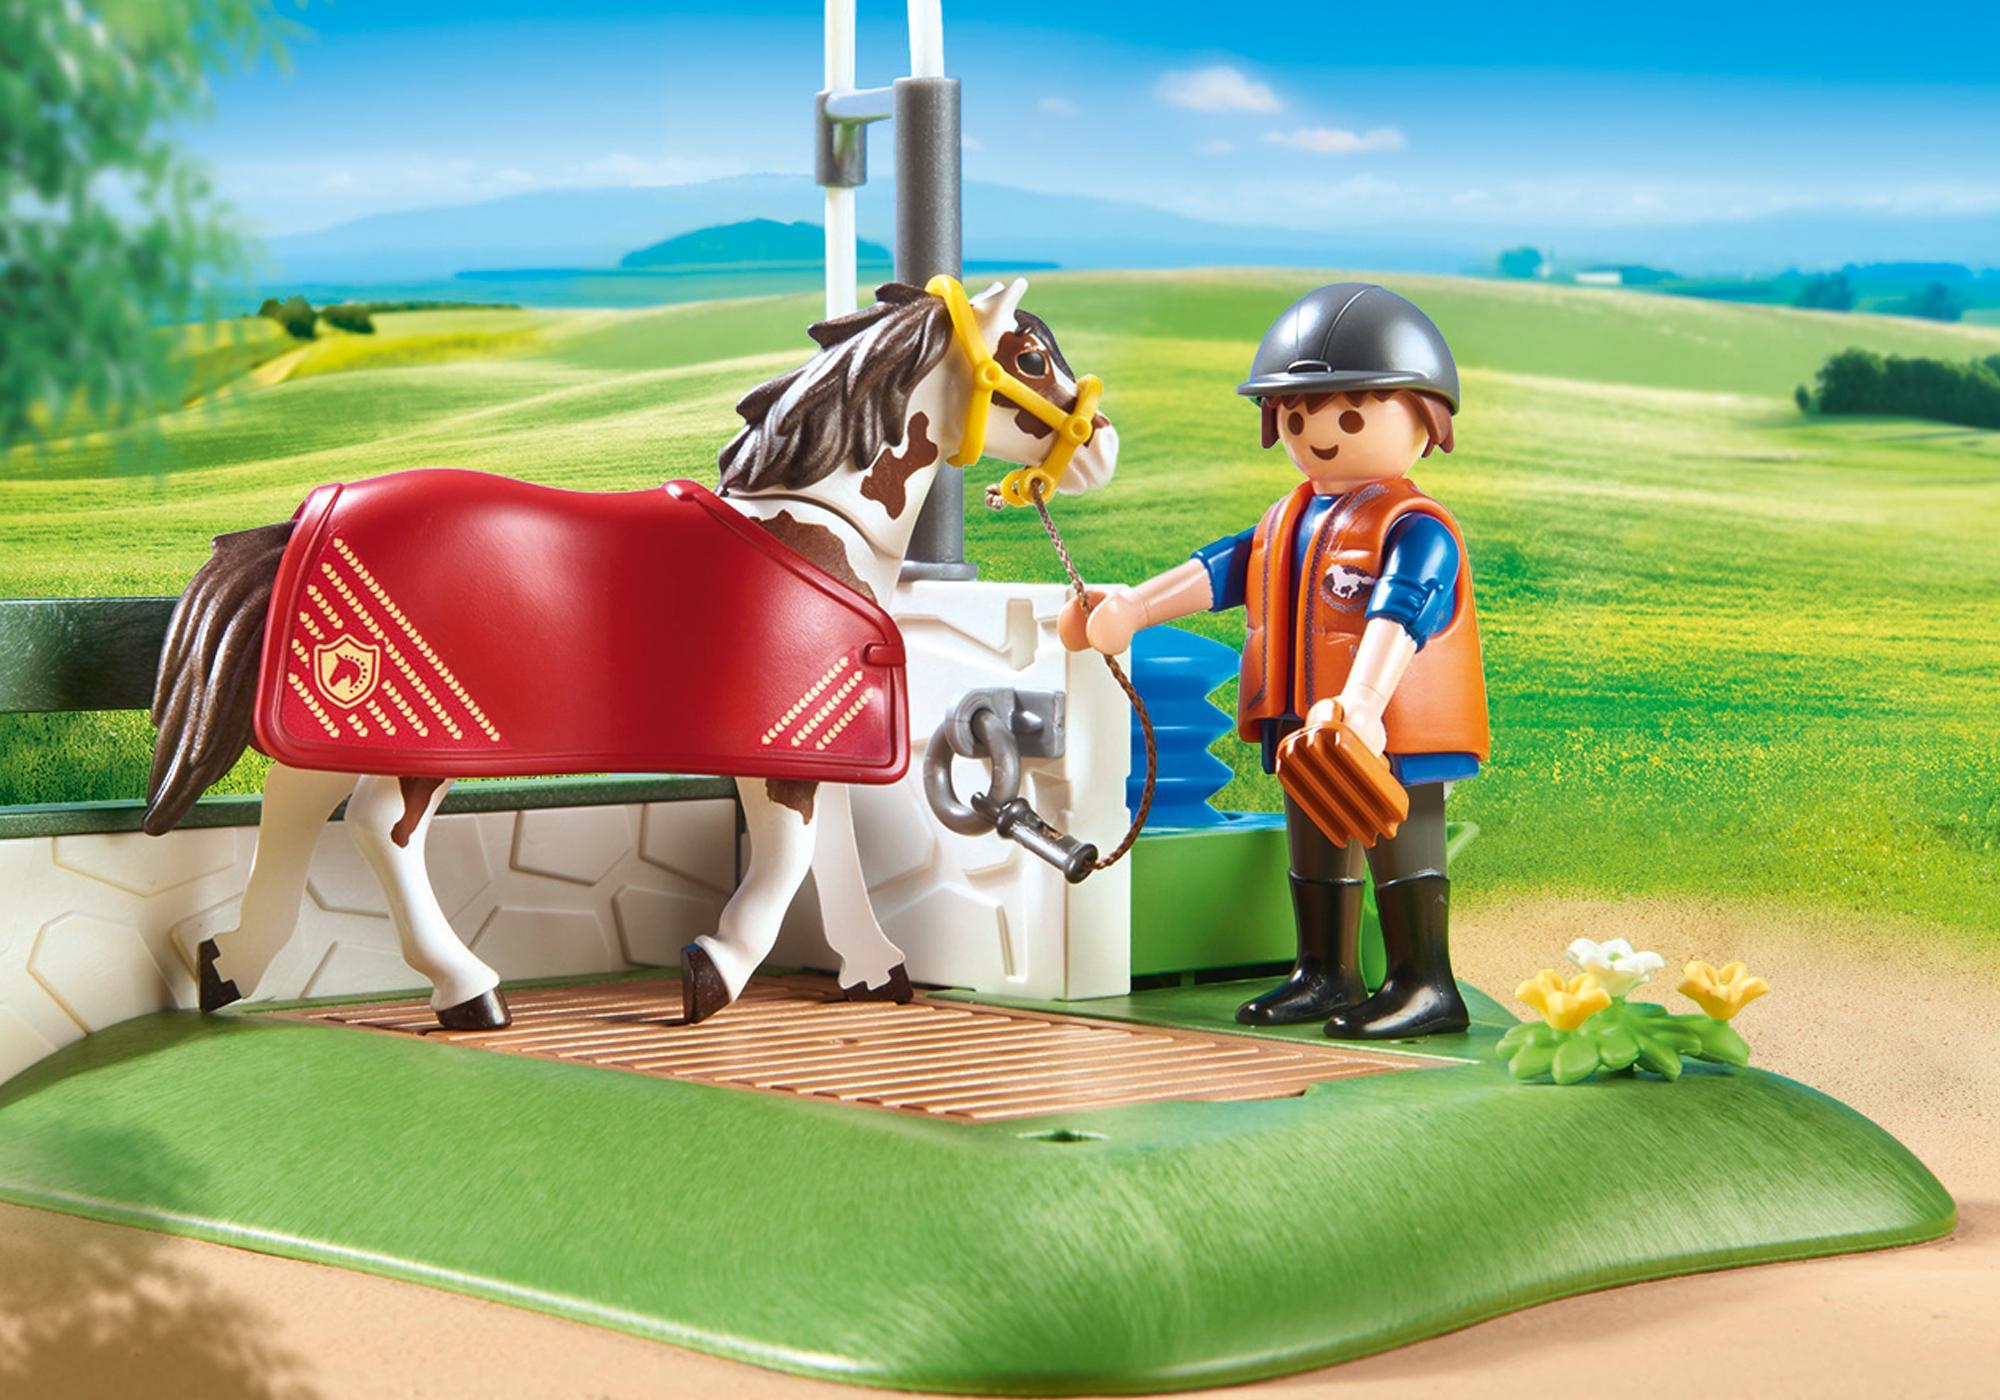 http://media.playmobil.com/i/playmobil/6929_product_extra2/Box de lavage pour chevaux